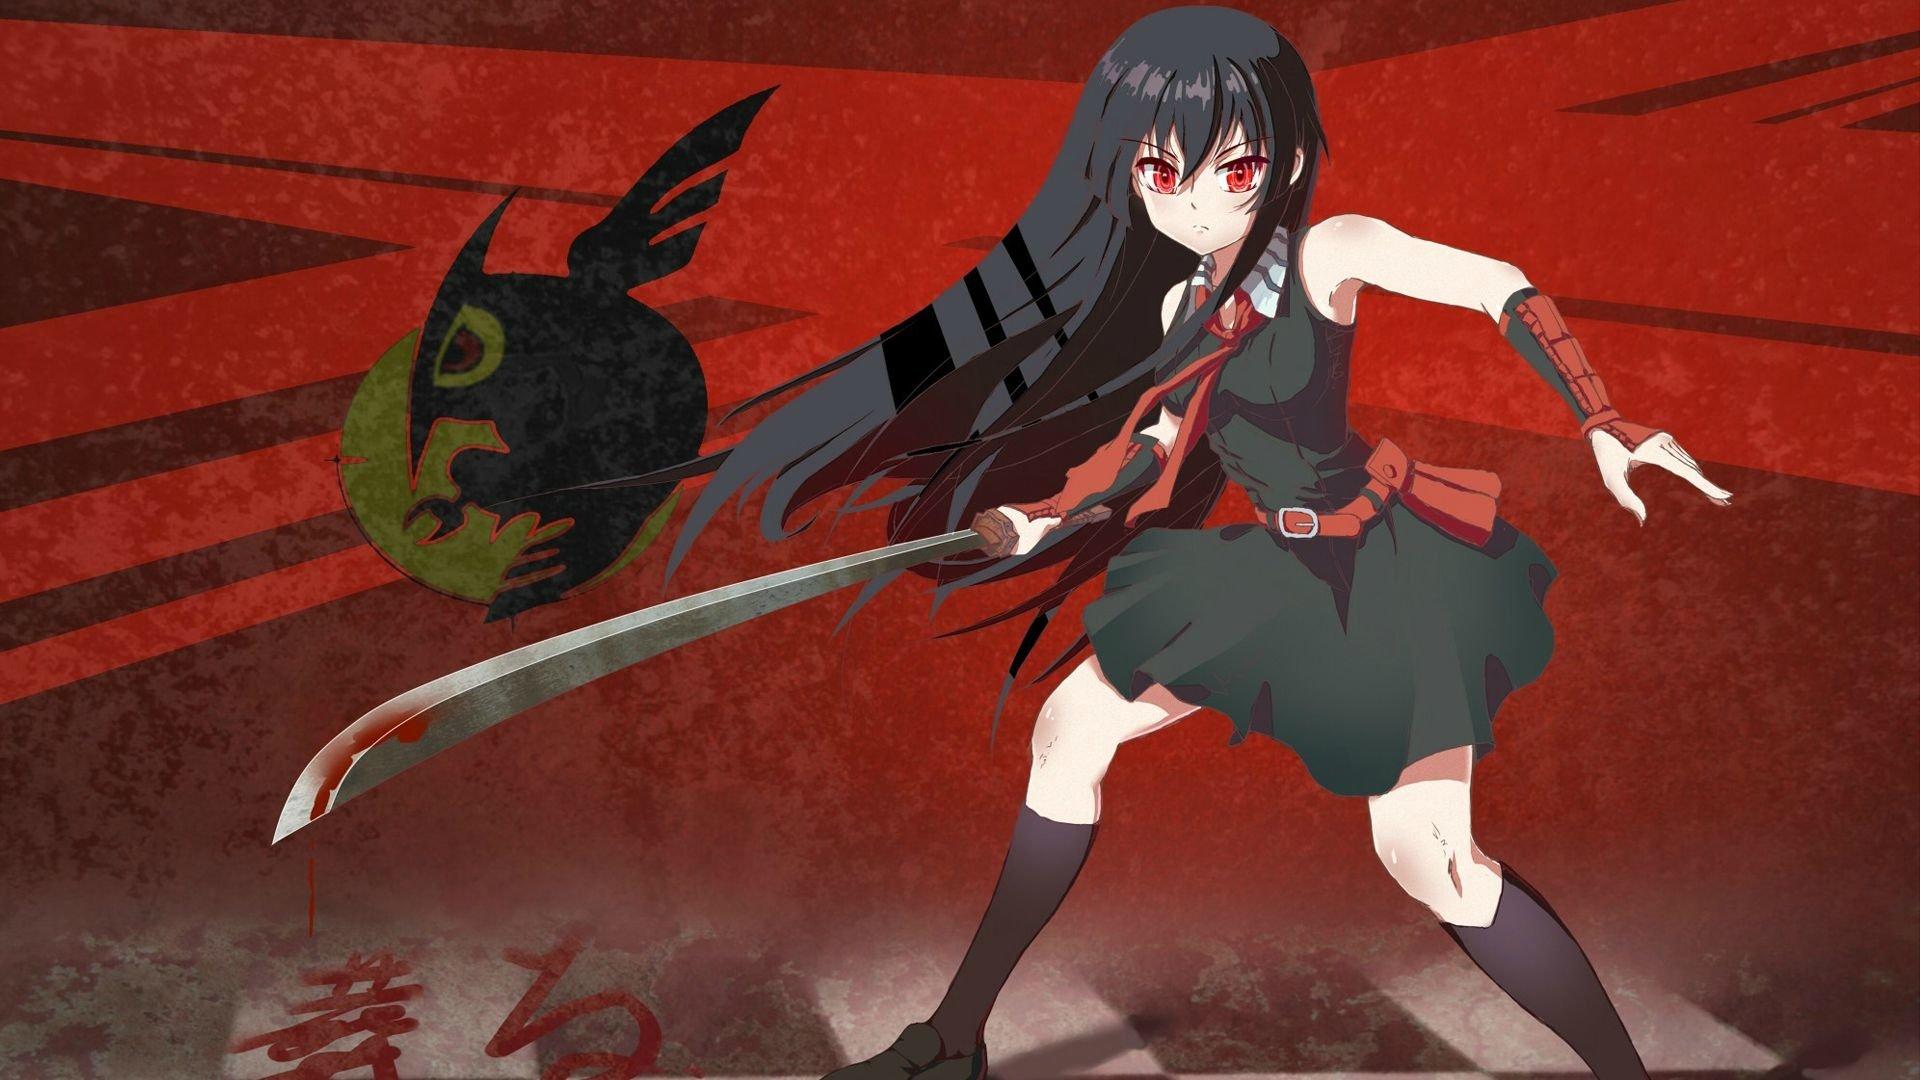 Akame Ga Kill Iphone Wallpaper Akame Ga Kill Full Hd Wallpaper And Background